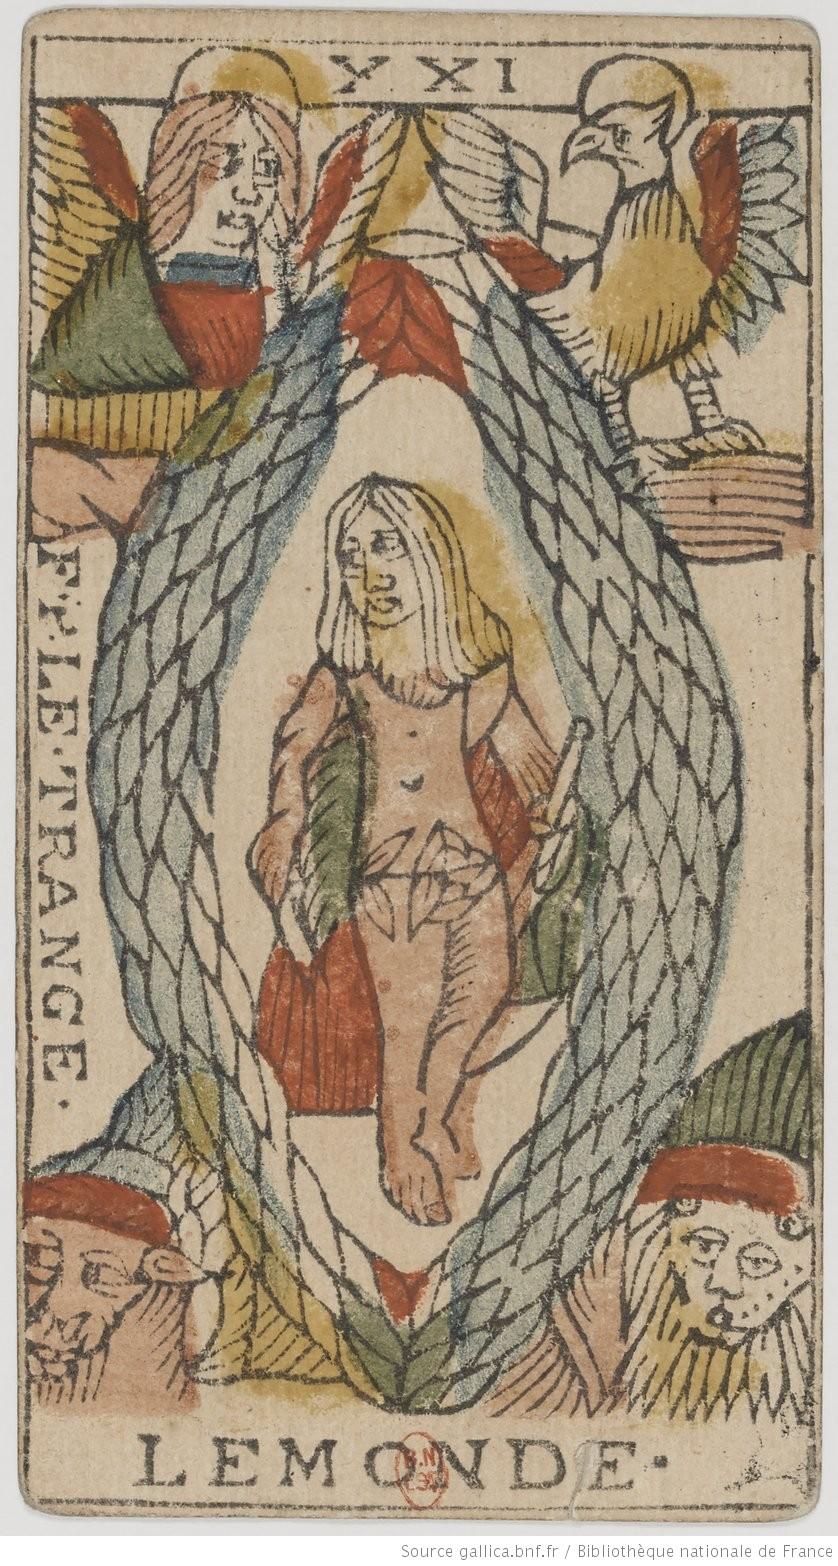 http://gallica.bnf.fr/ark:/12148/btv1b10537343h/f155.highres